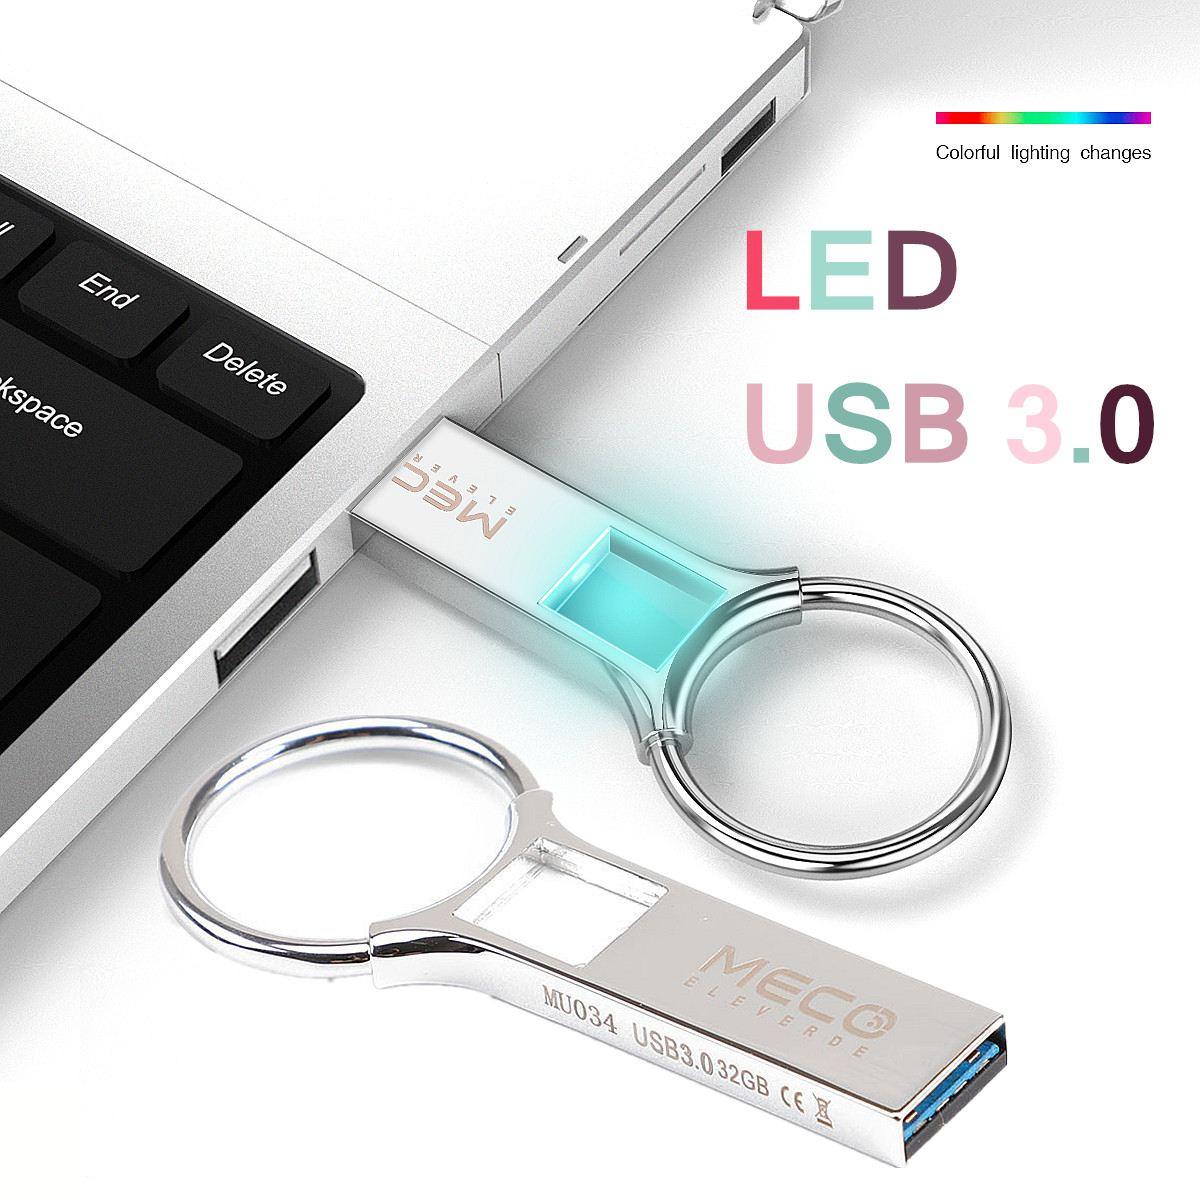 High Speed Usb 3.0 Pen Drive Led Flash USB Flash Drive External Storage Memory Stick 32GB Micro Keychain USB Stick Pendrive